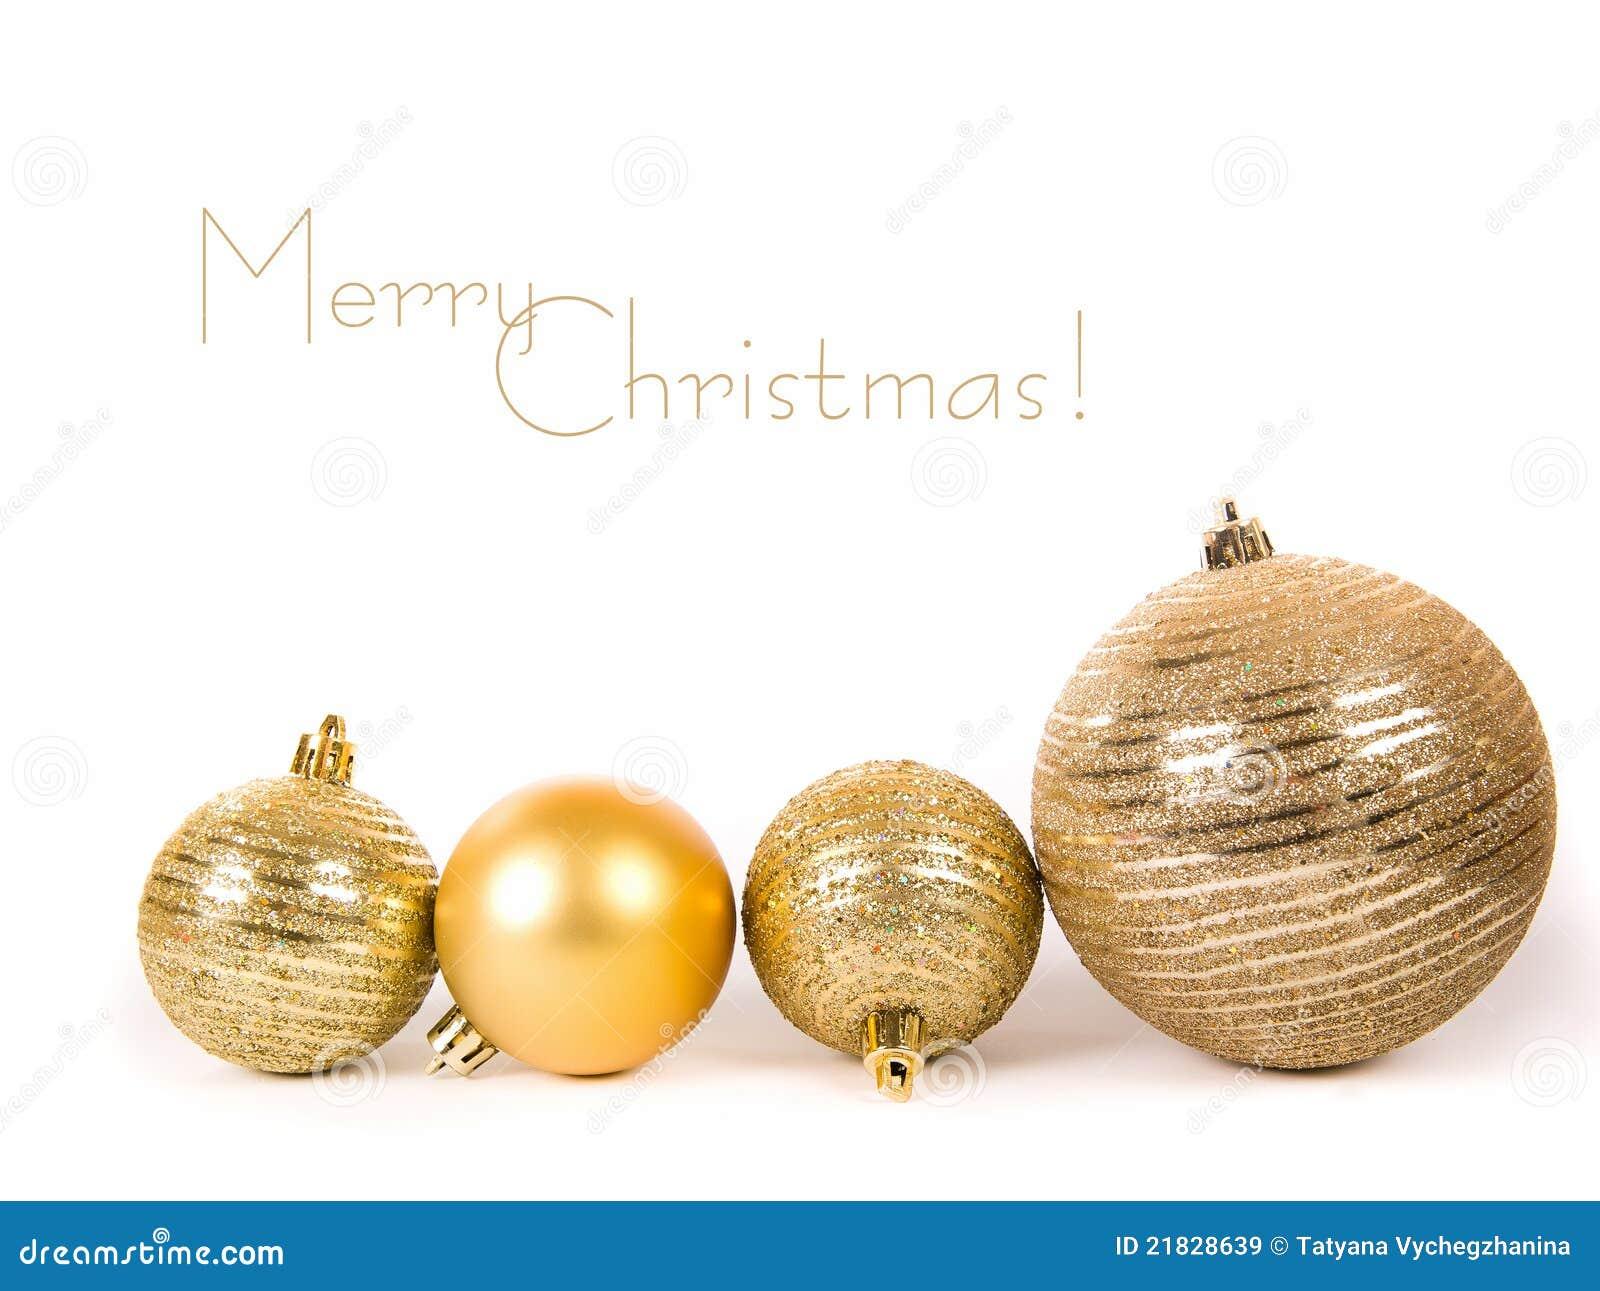 Goldene Weihnachtskugeln.Goldene Weihnachtskugeln Stockbild Bild Von Platz Marry 21828639